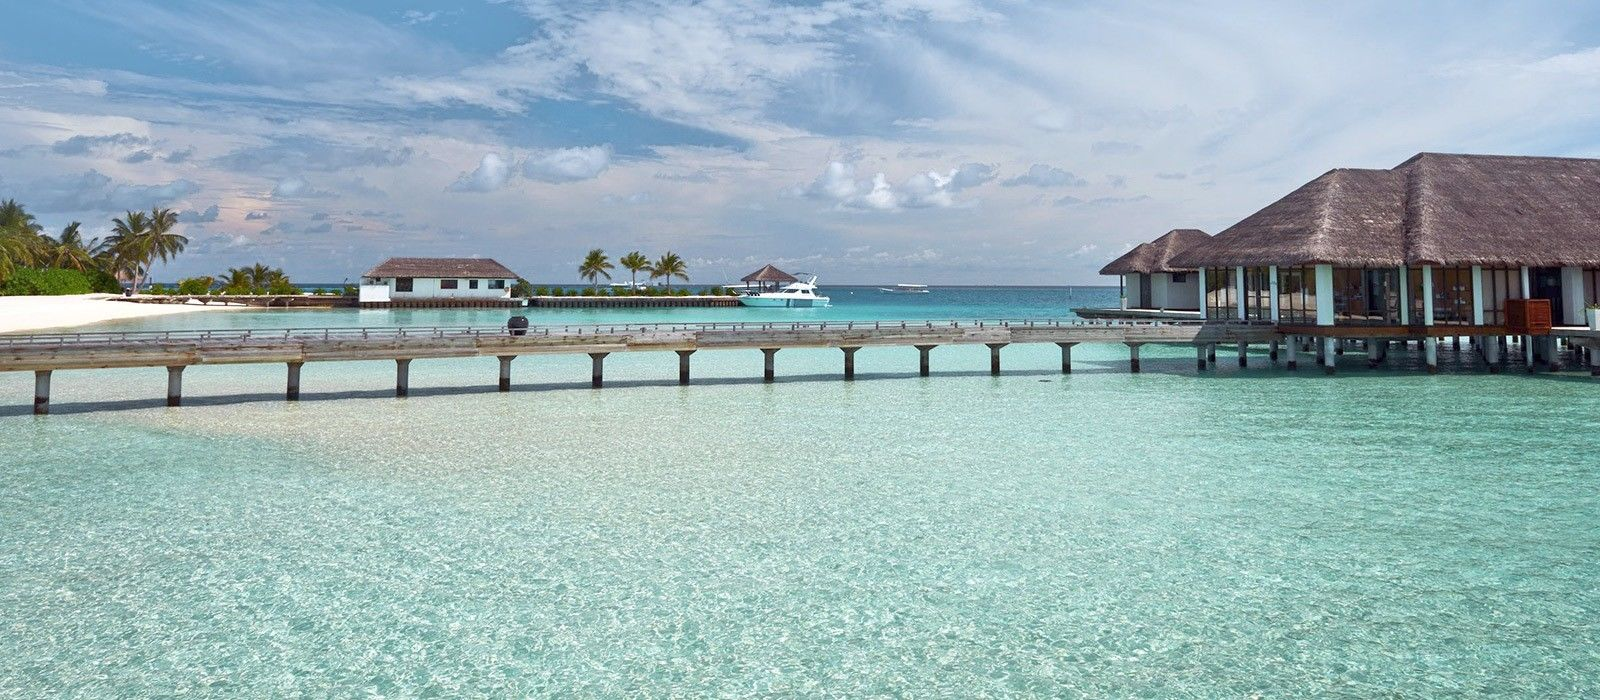 Sri Lankan Heritage & Maldives Luxury Tour Trip 7